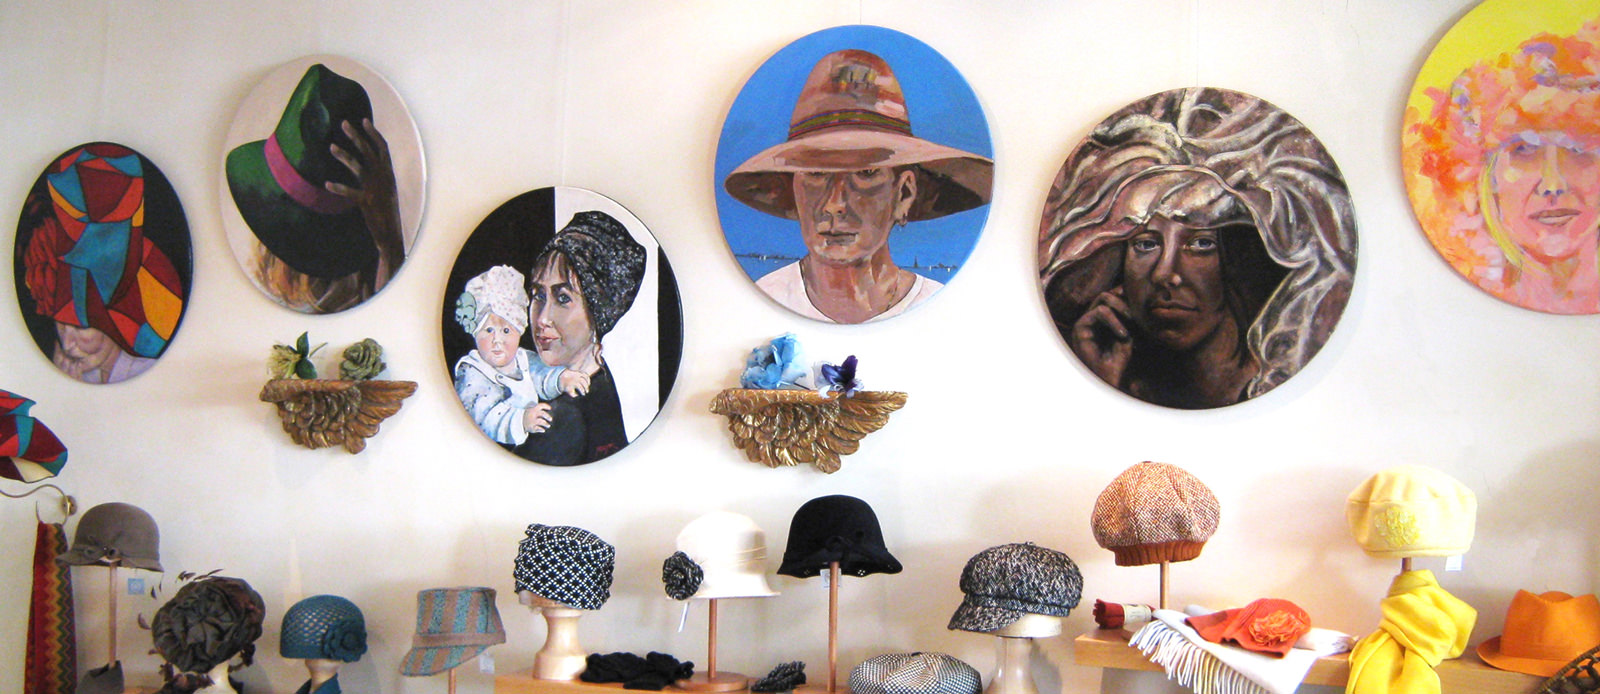 Atelierkurs der Malerin Carolin Beyer